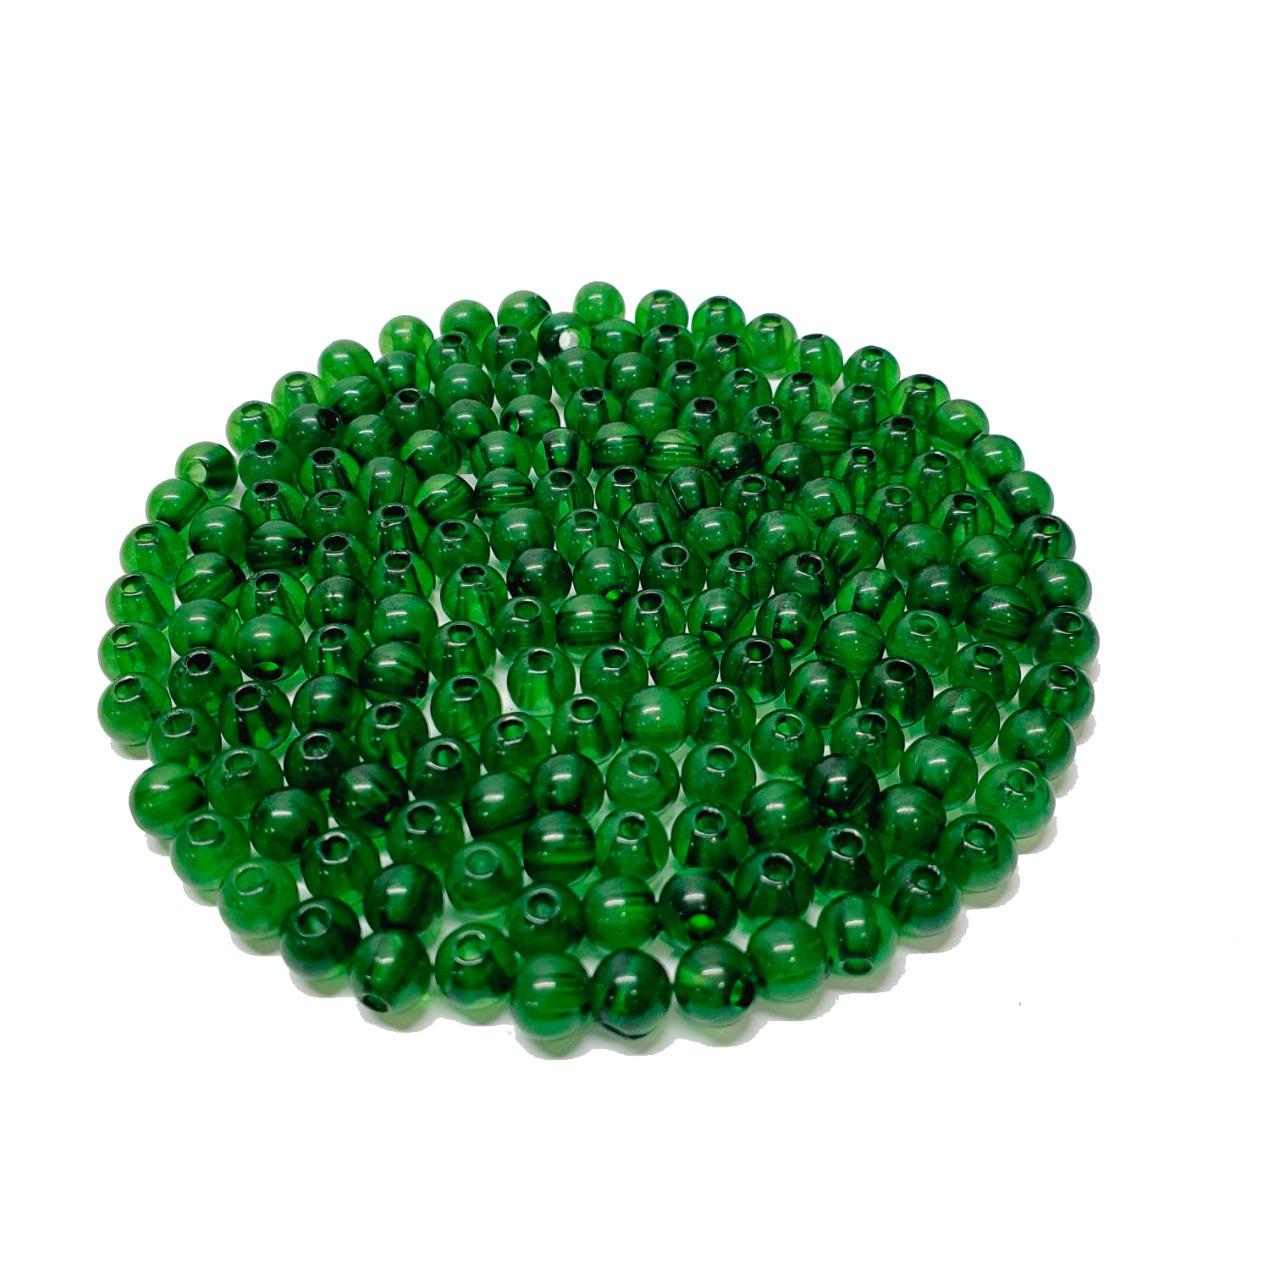 Bola de Resina Verde Escuro Transparente